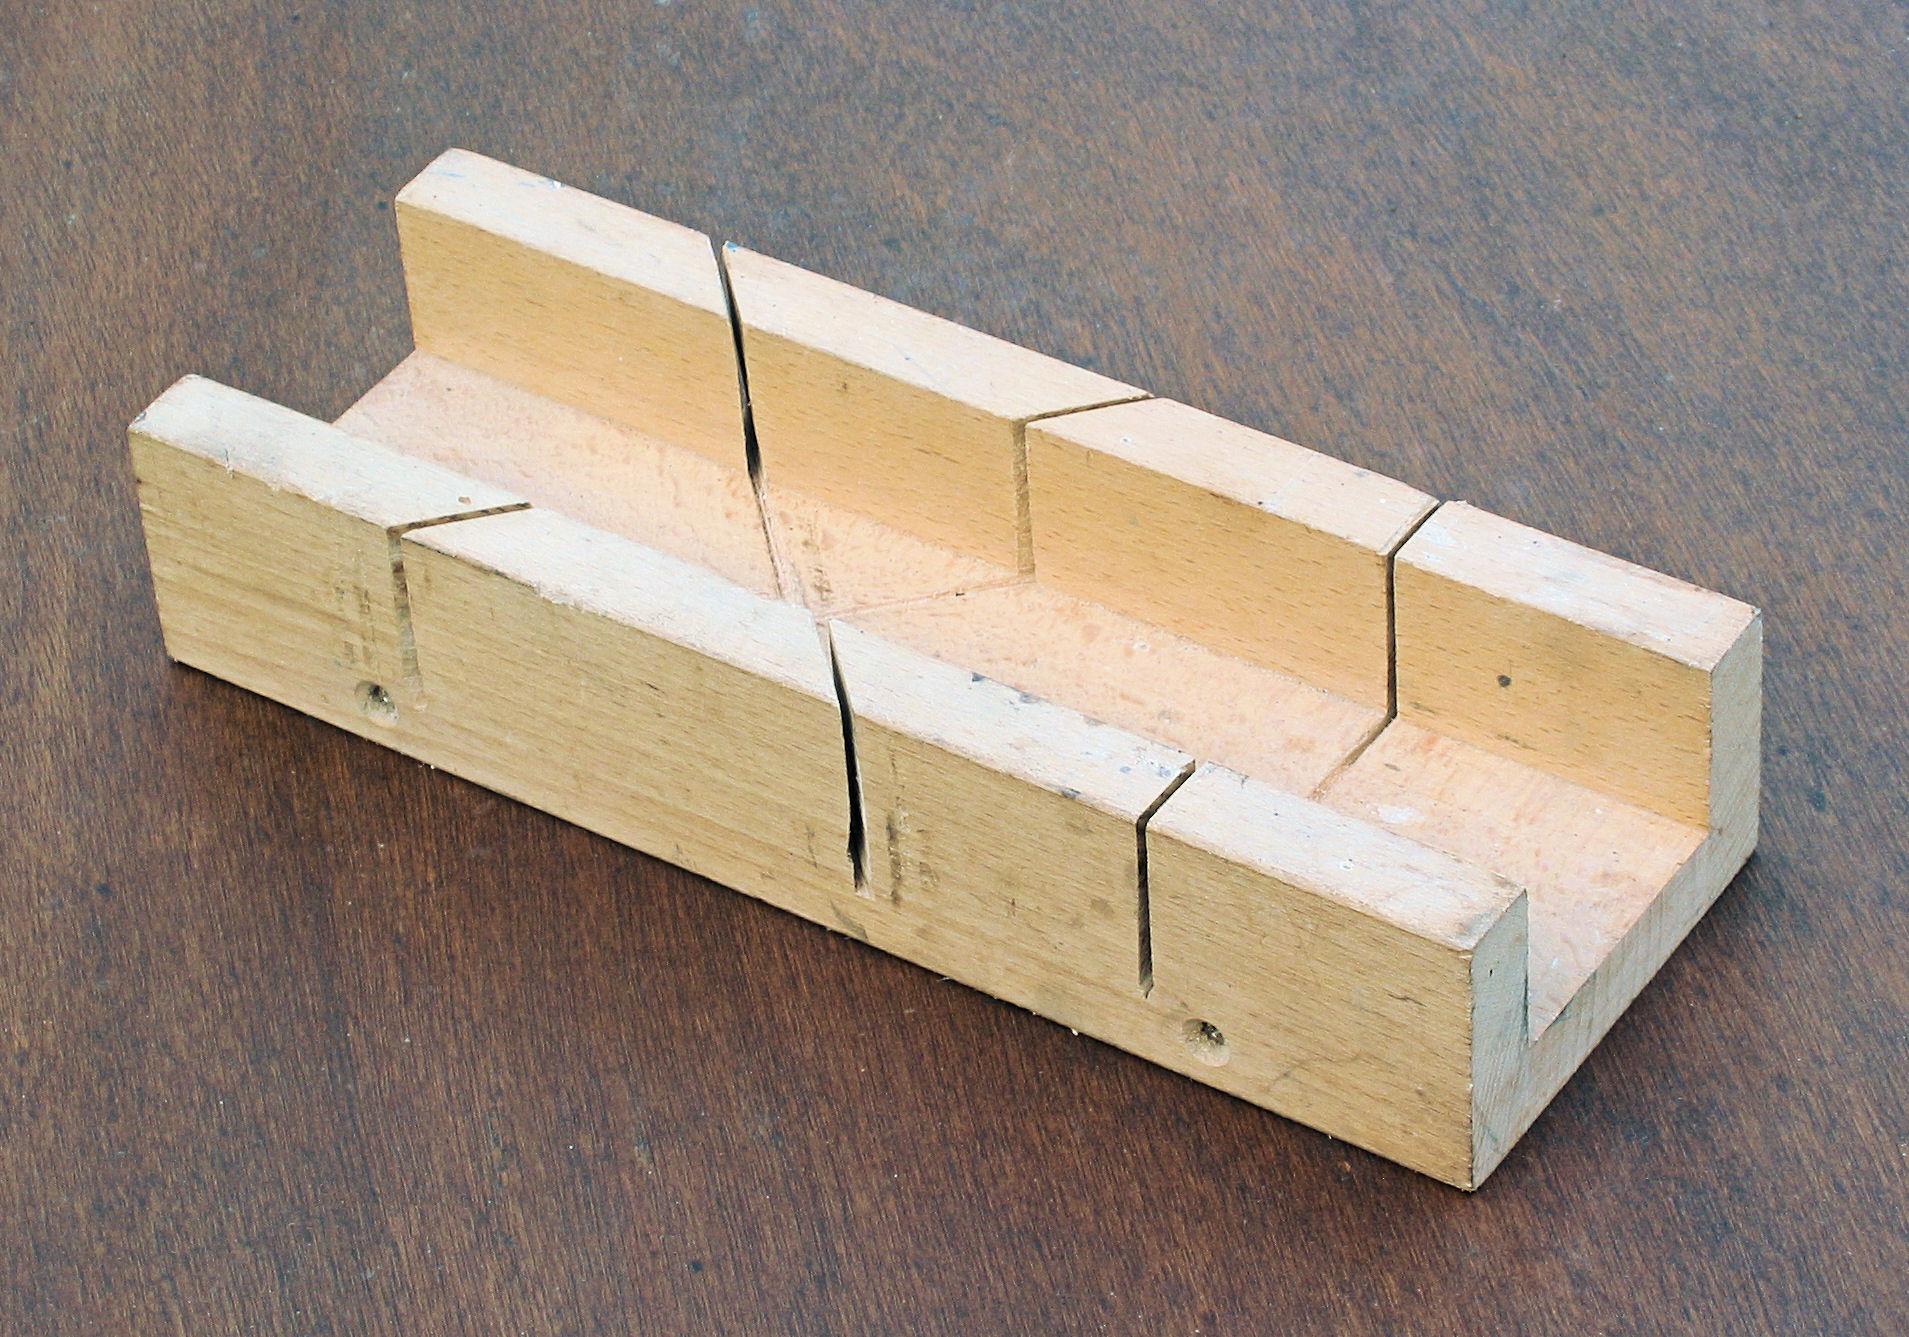 Caja de ingletes mi carpinteria - Guia para construir ...